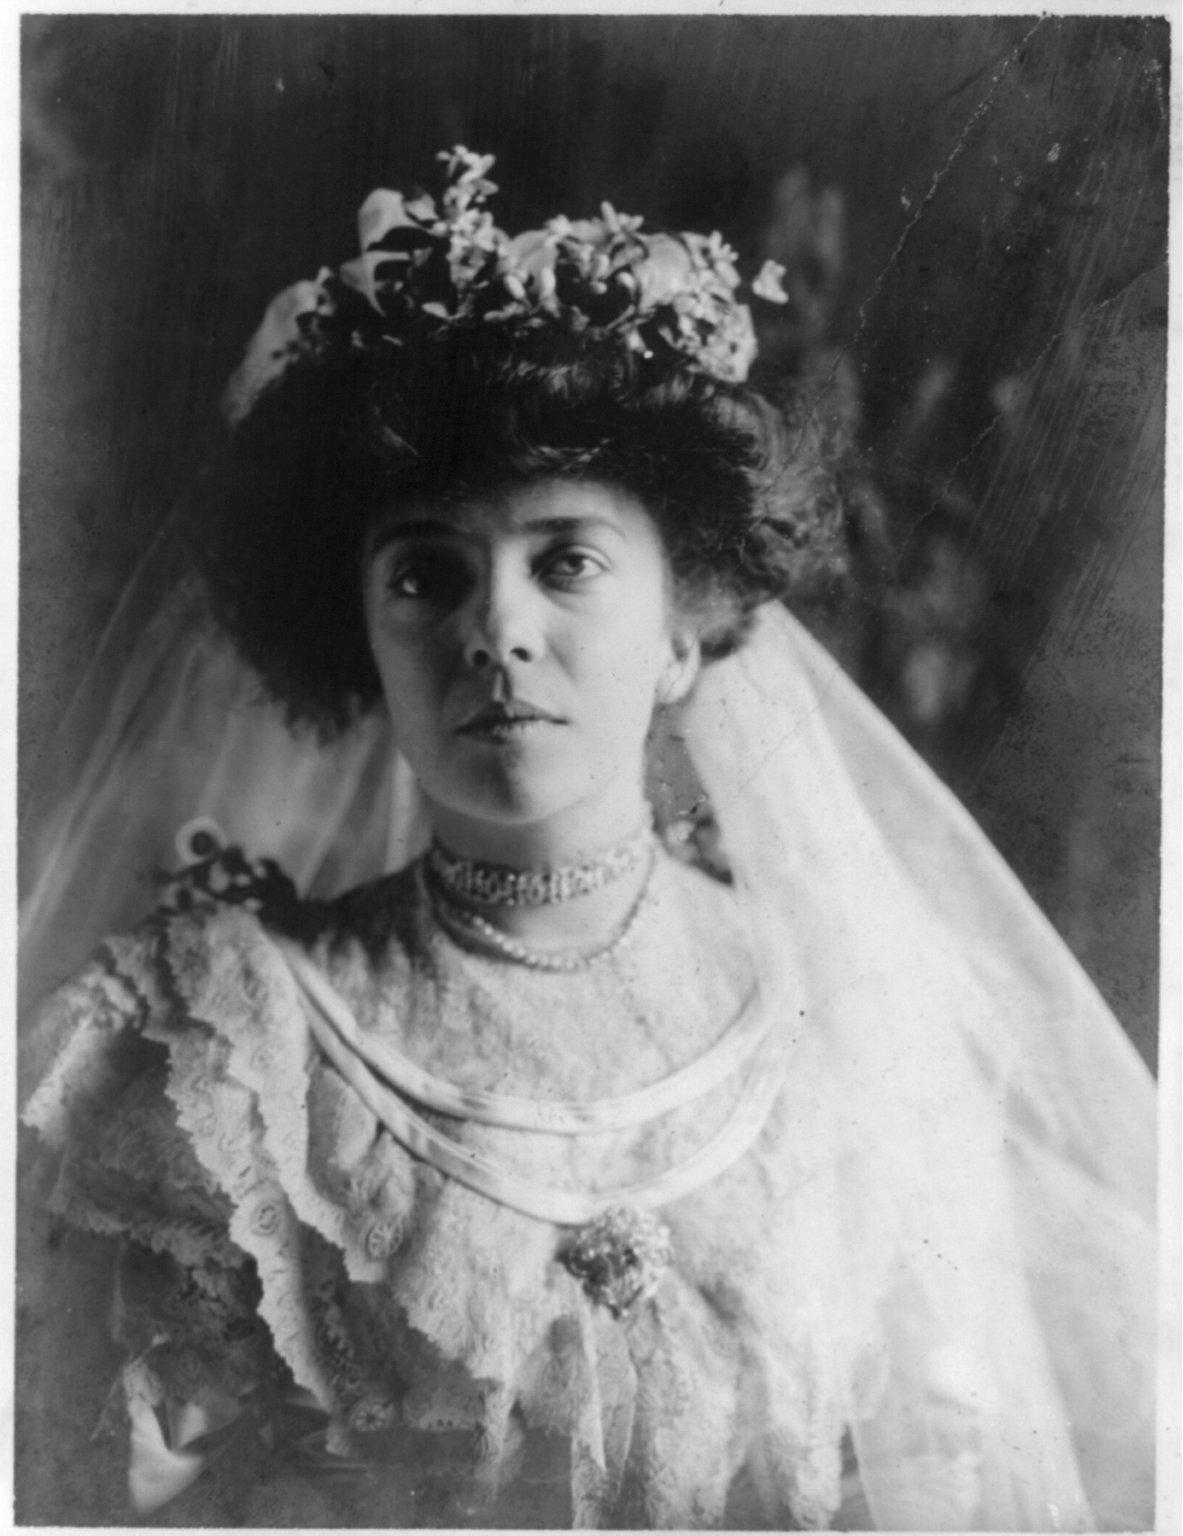 Alice_Roosevelt_Longworth_wedding_gown.jpg